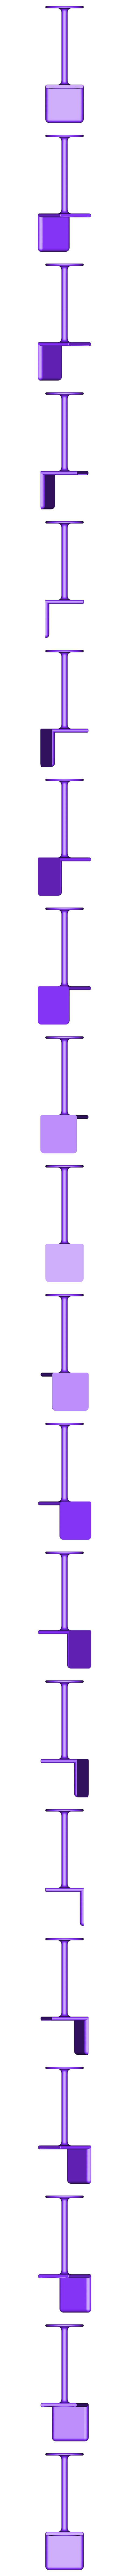 sedia_Bar_V2.stl Download free STL file Barbie Bar Stool • 3D printer template, alberto_da_meduna